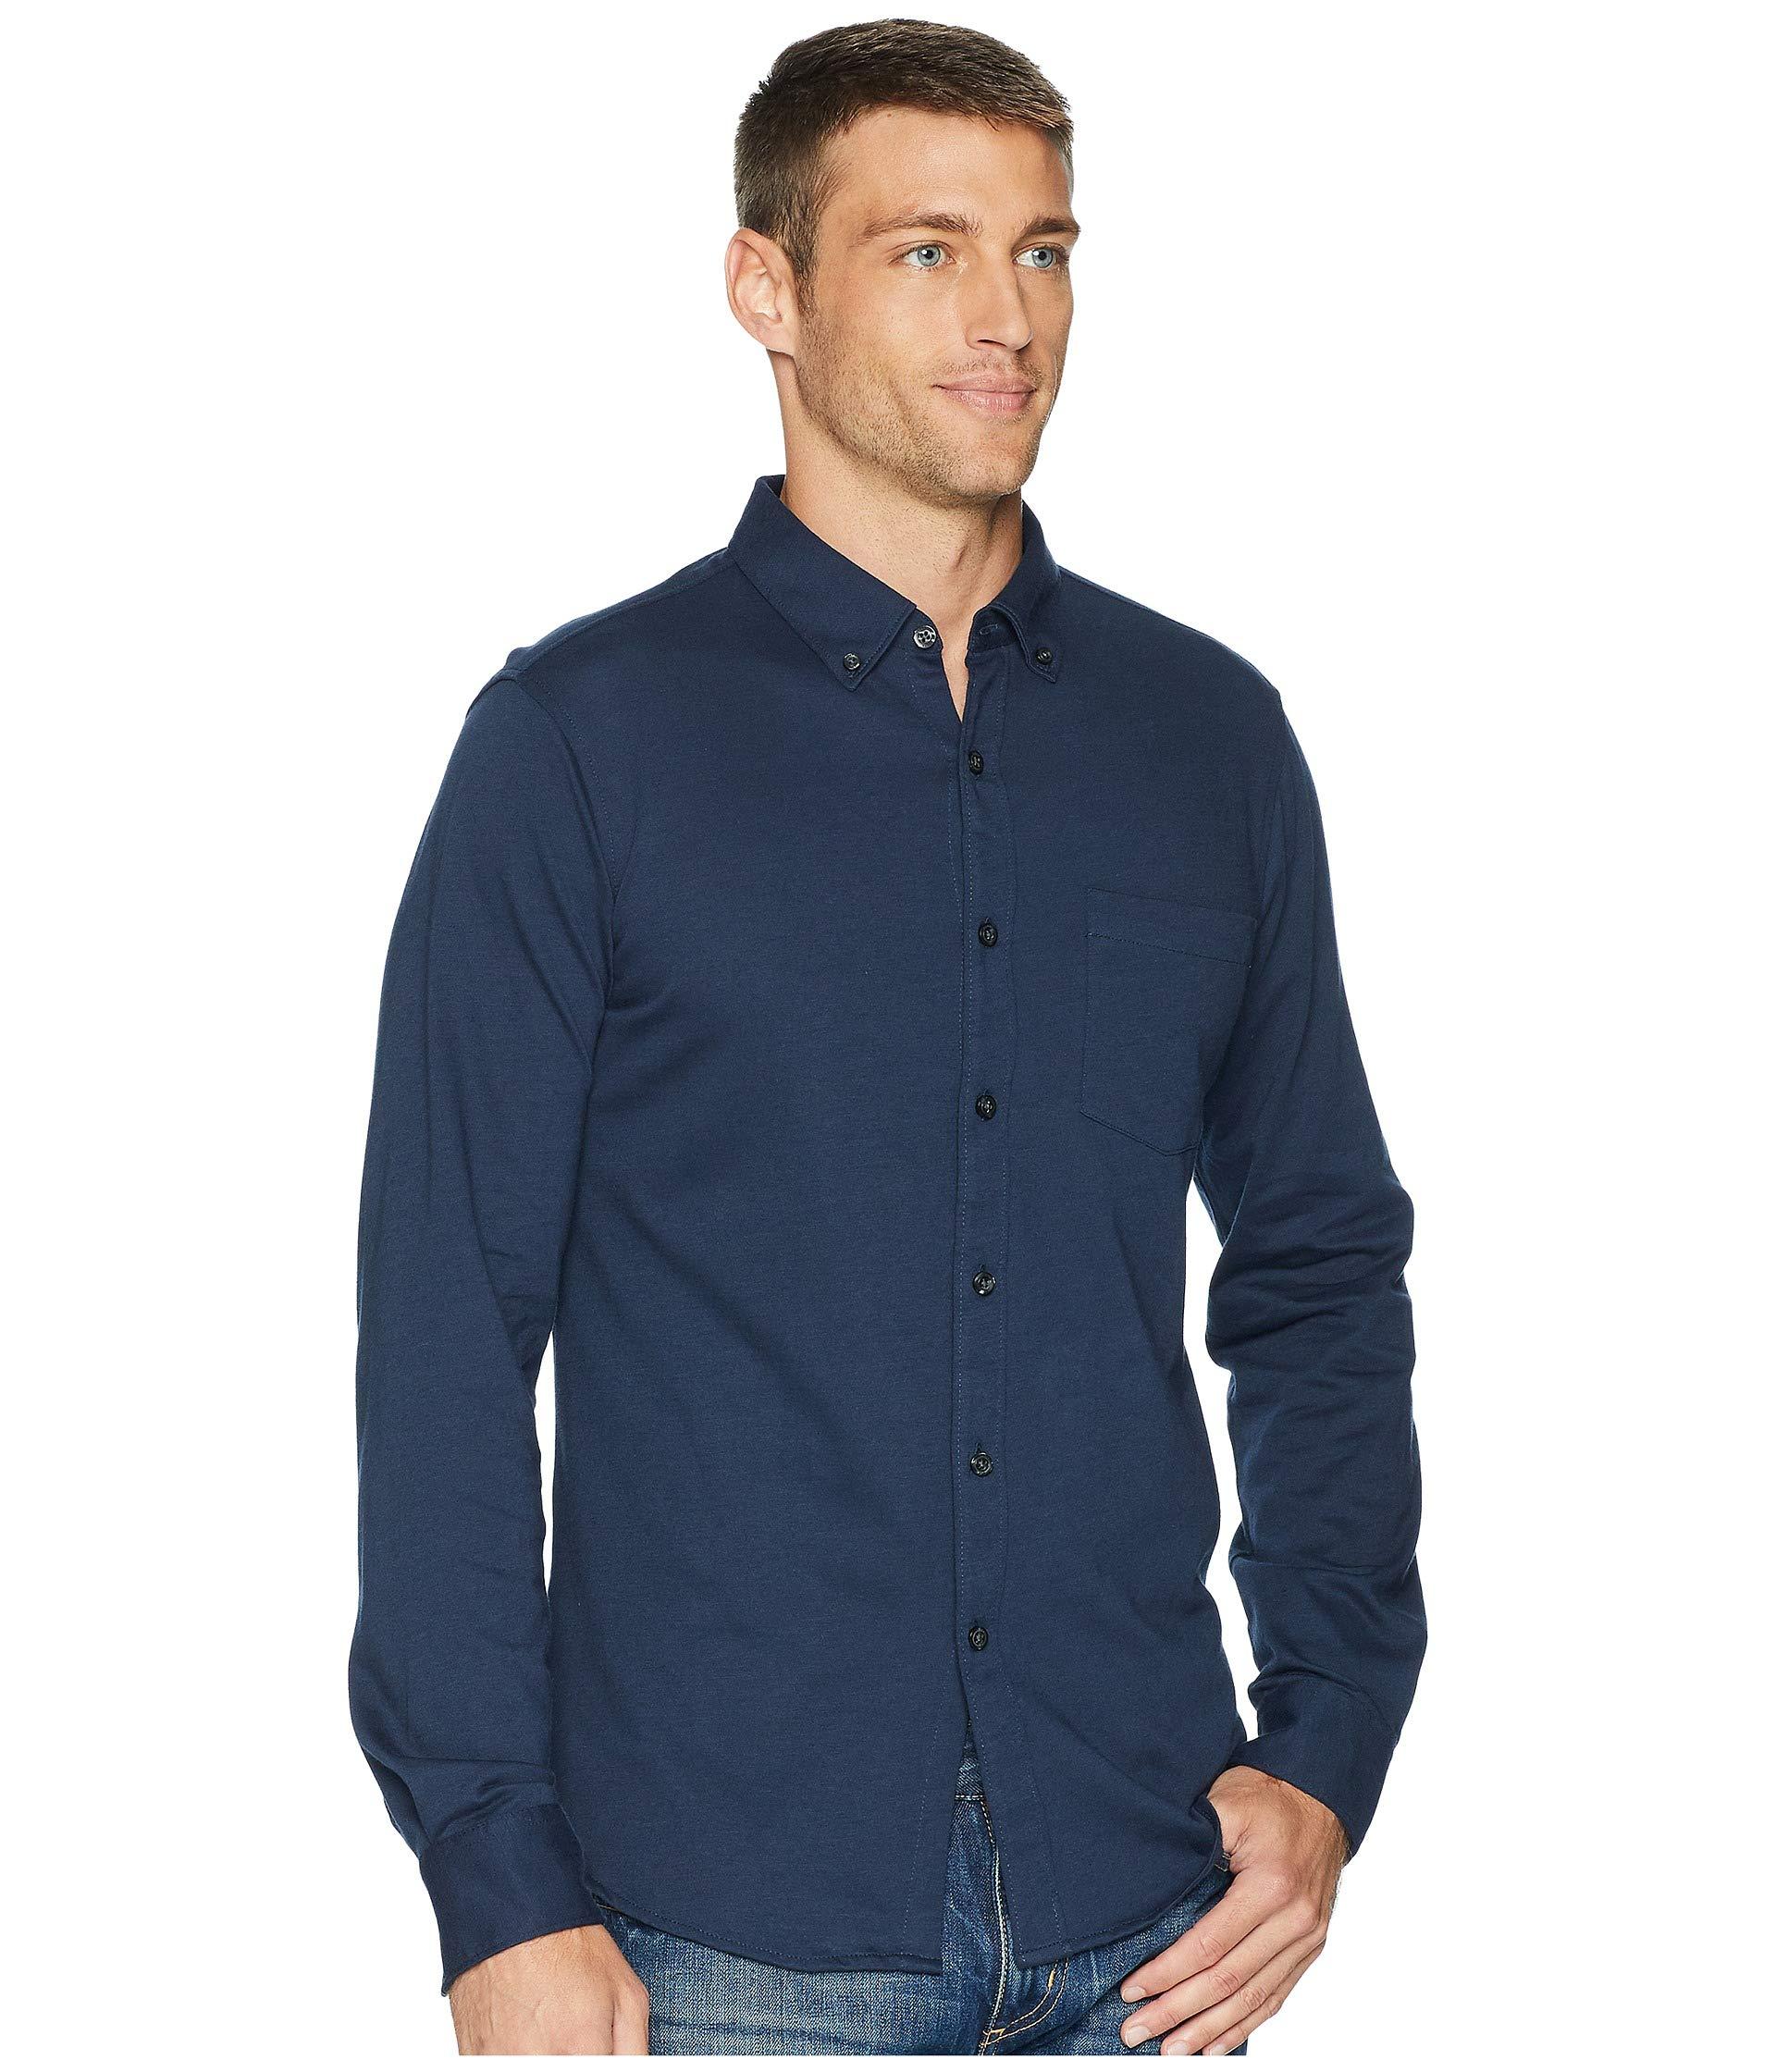 Slim Ellis Fit Knit Perry Blue Heron Shirt C65Pnqw